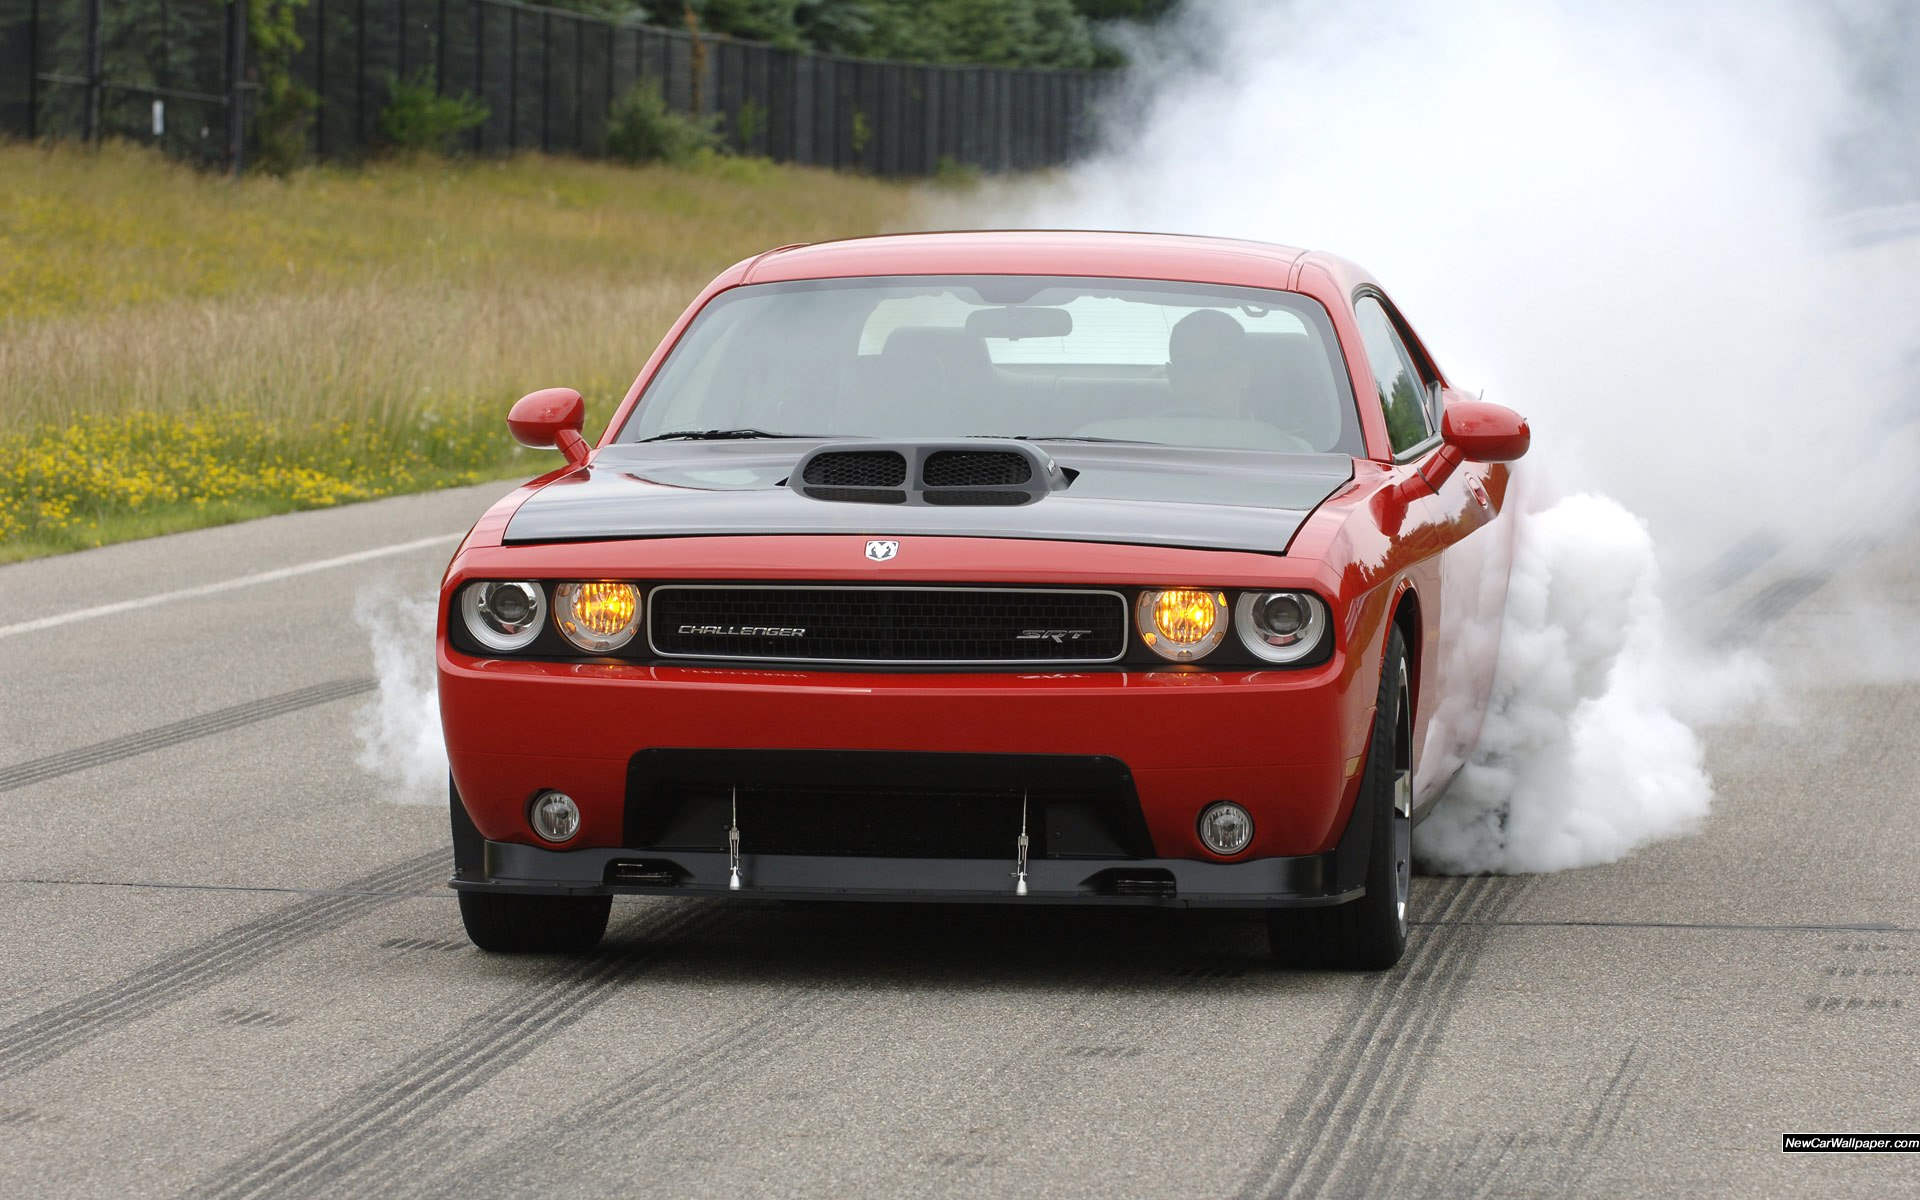 2560x1600 Smoke Muscle Cars Drifting Cars Vehicles Burnout Dodge